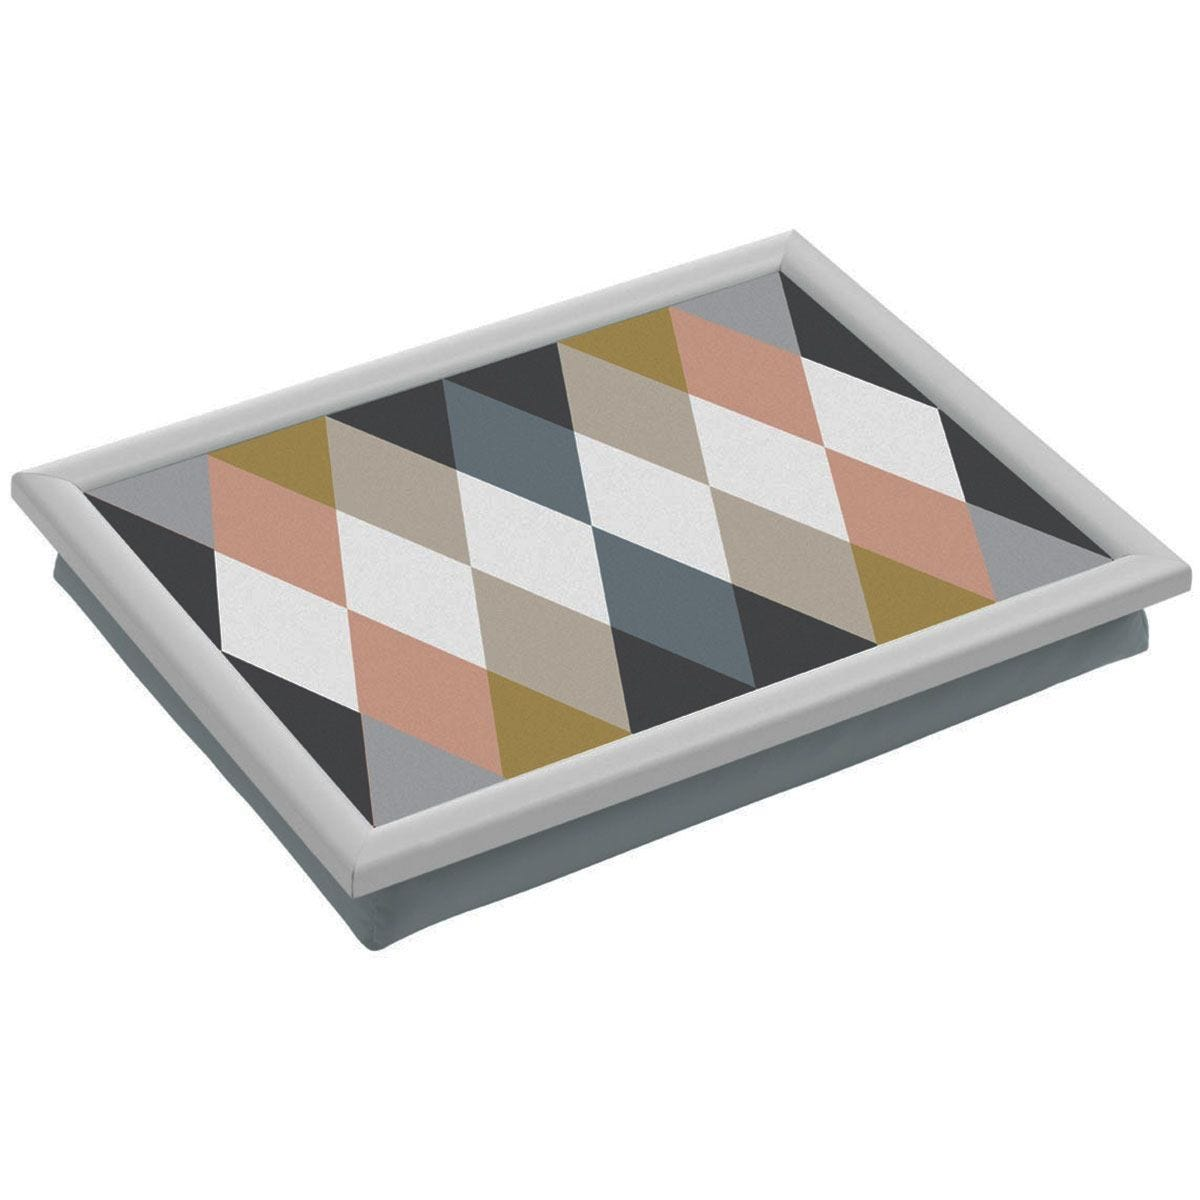 Premier Housewares Cirque Lap Tray